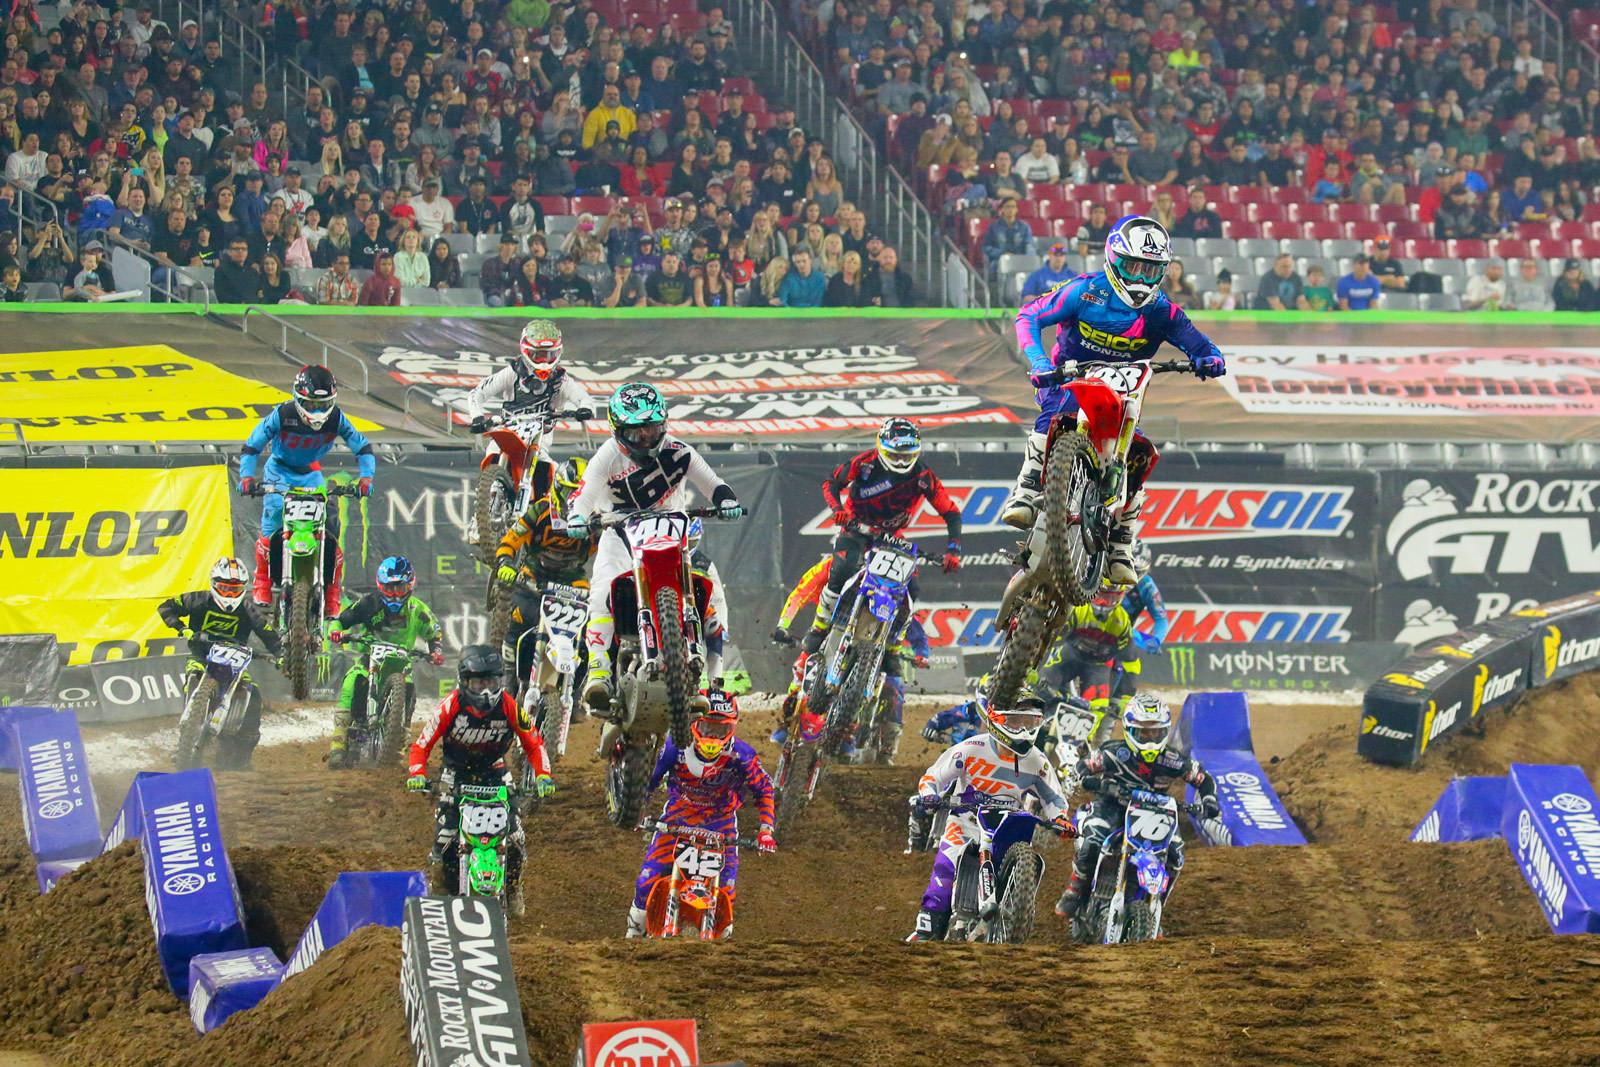 250 Heat Race Two Start - Photo Blast: Glendale - Motocross Pictures - Vital MX